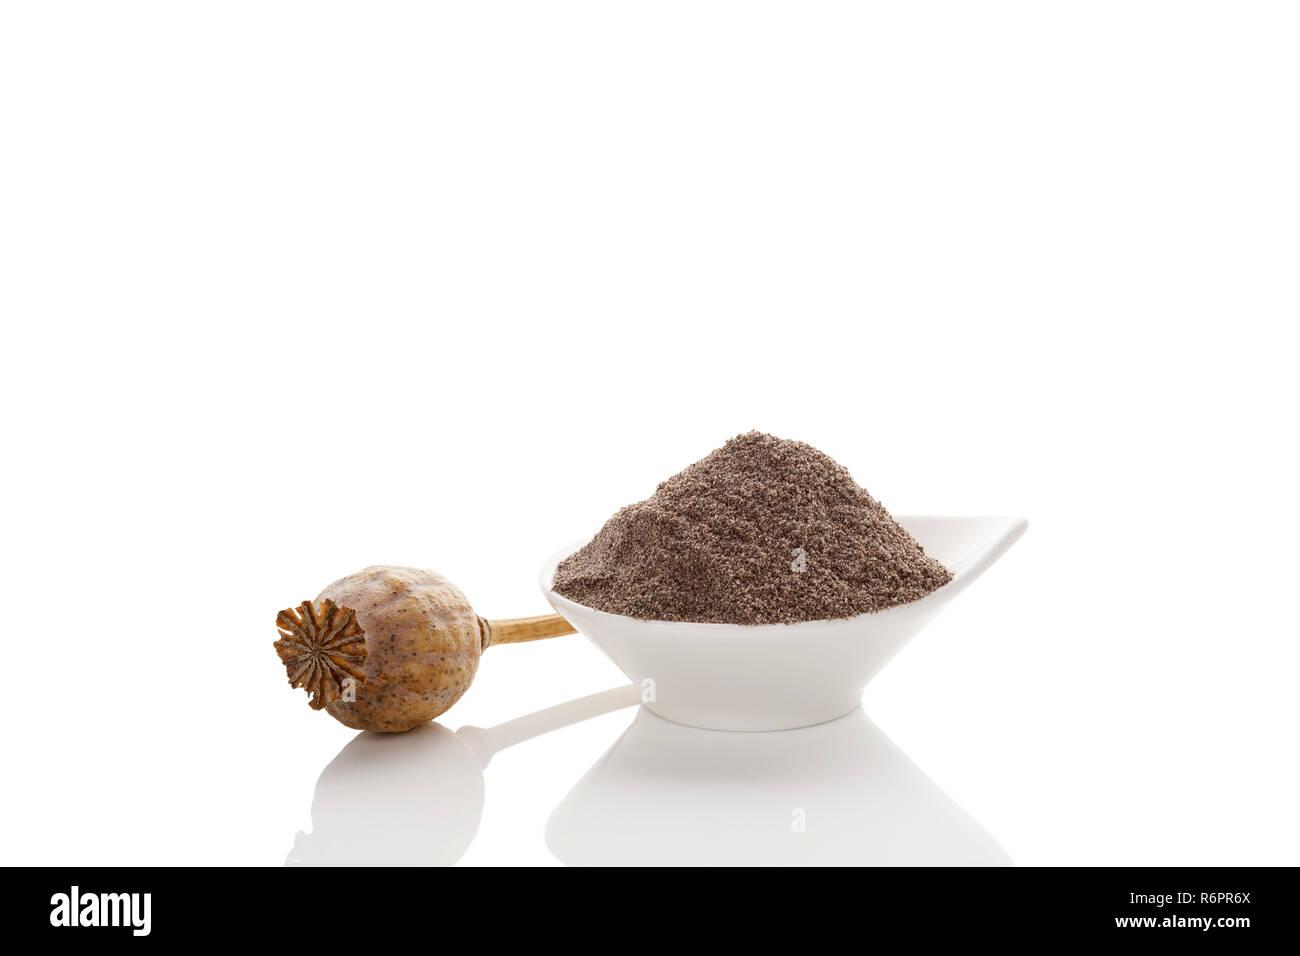 Poppy seeds and dry poppy pod. - Stock Image